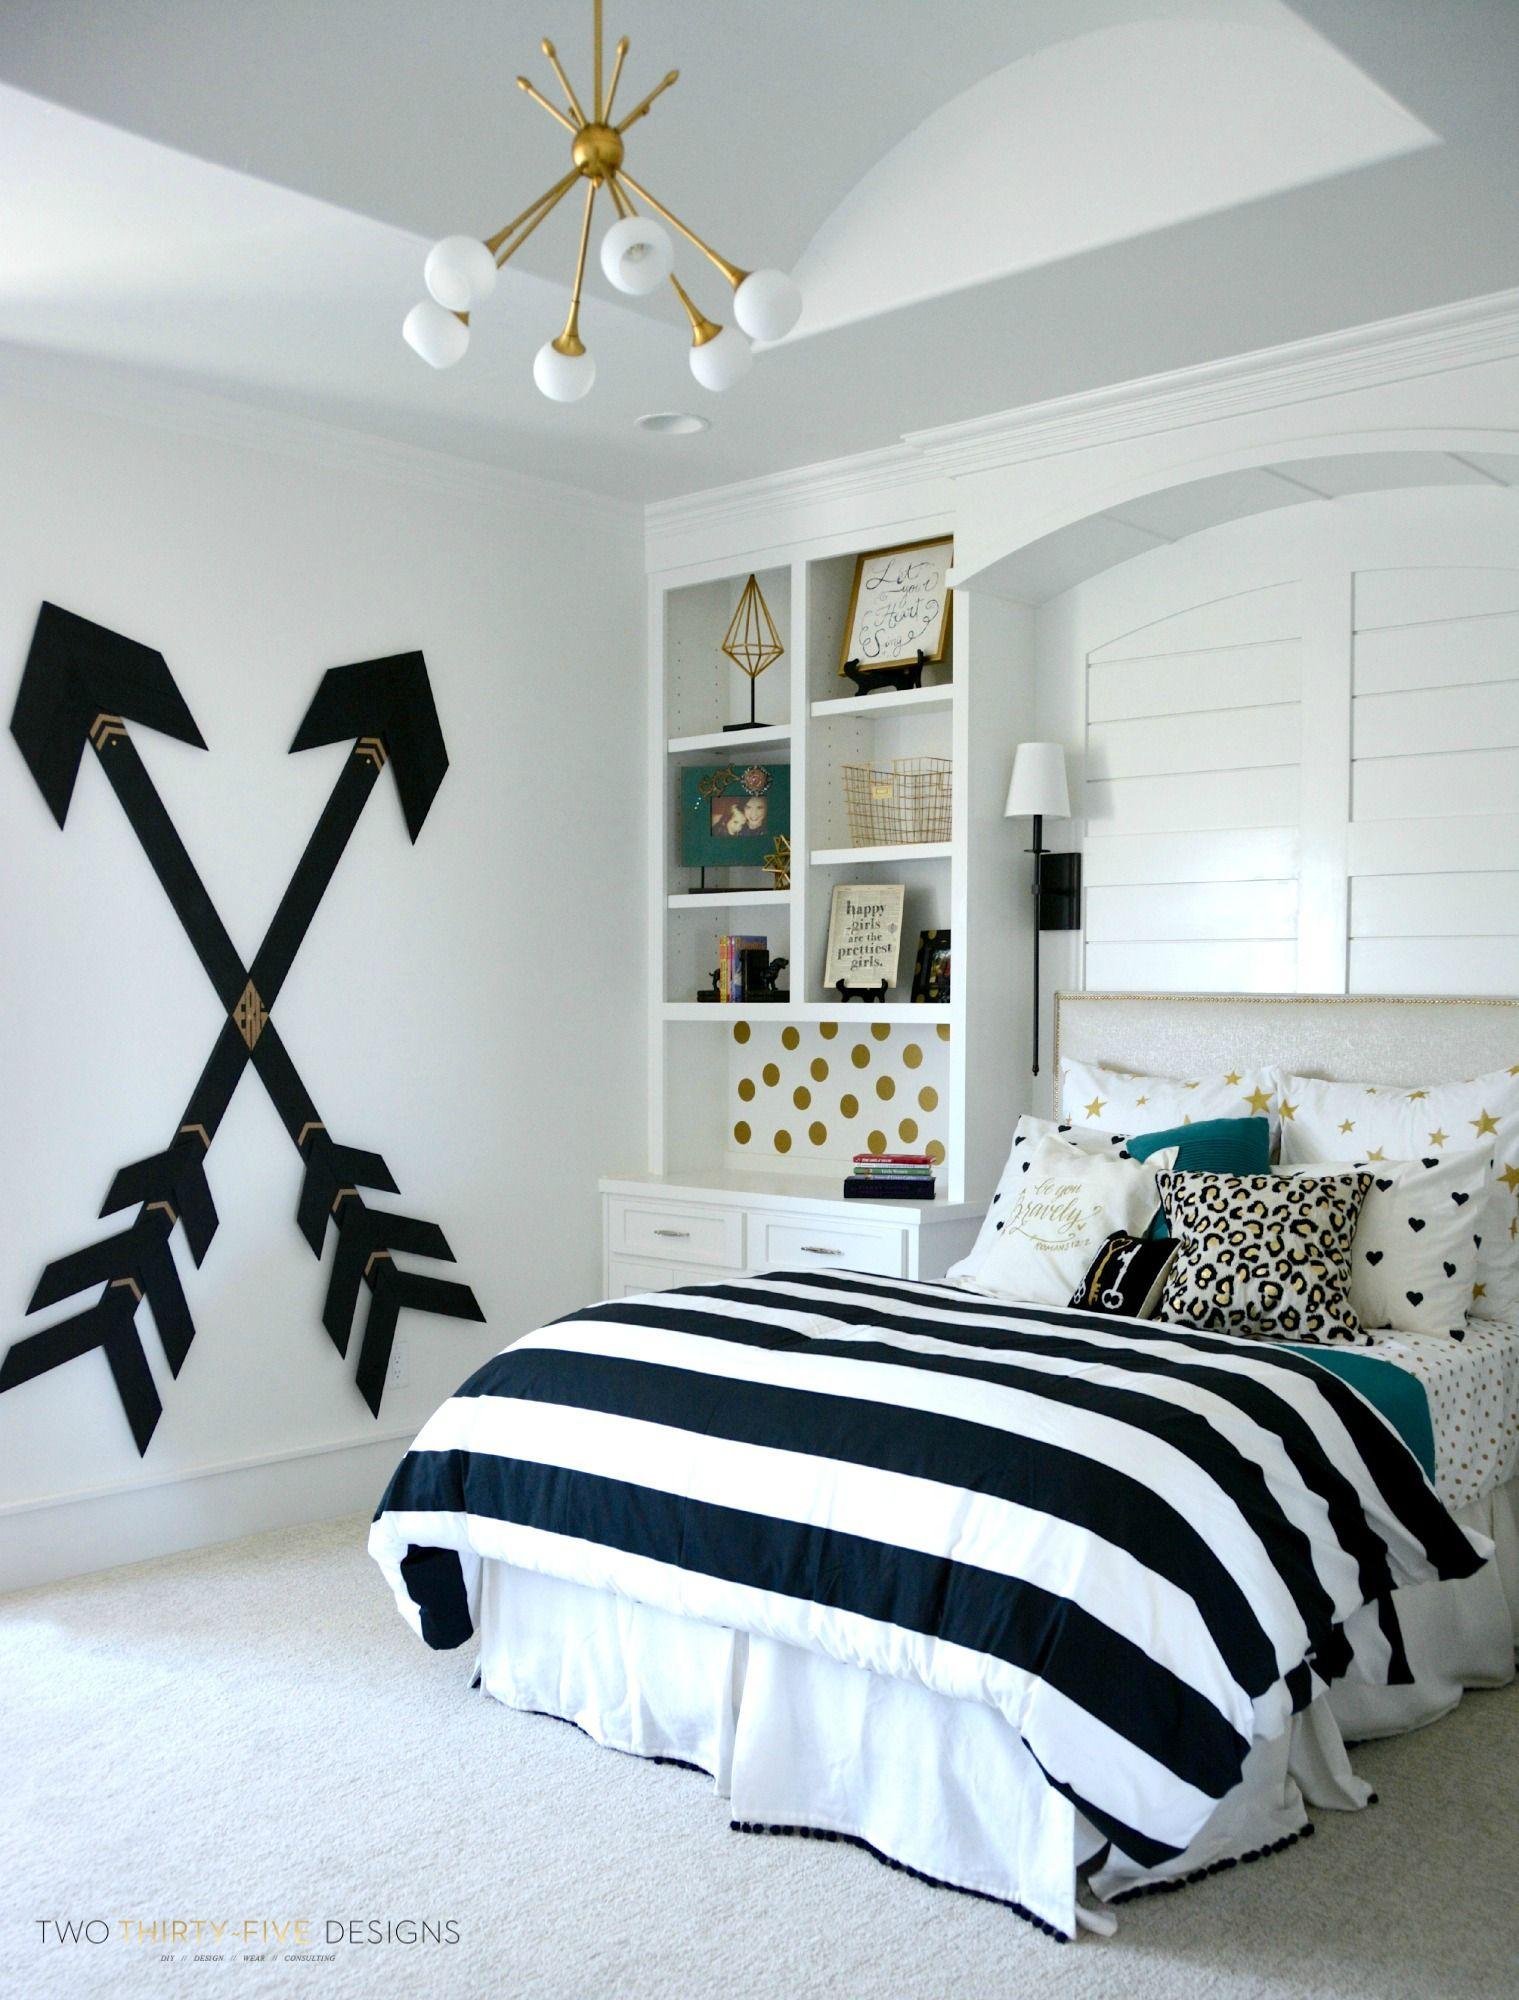 Best Wooden Wall Arrows Diy T**N Room Decor T**N Girl Rooms 400 x 300